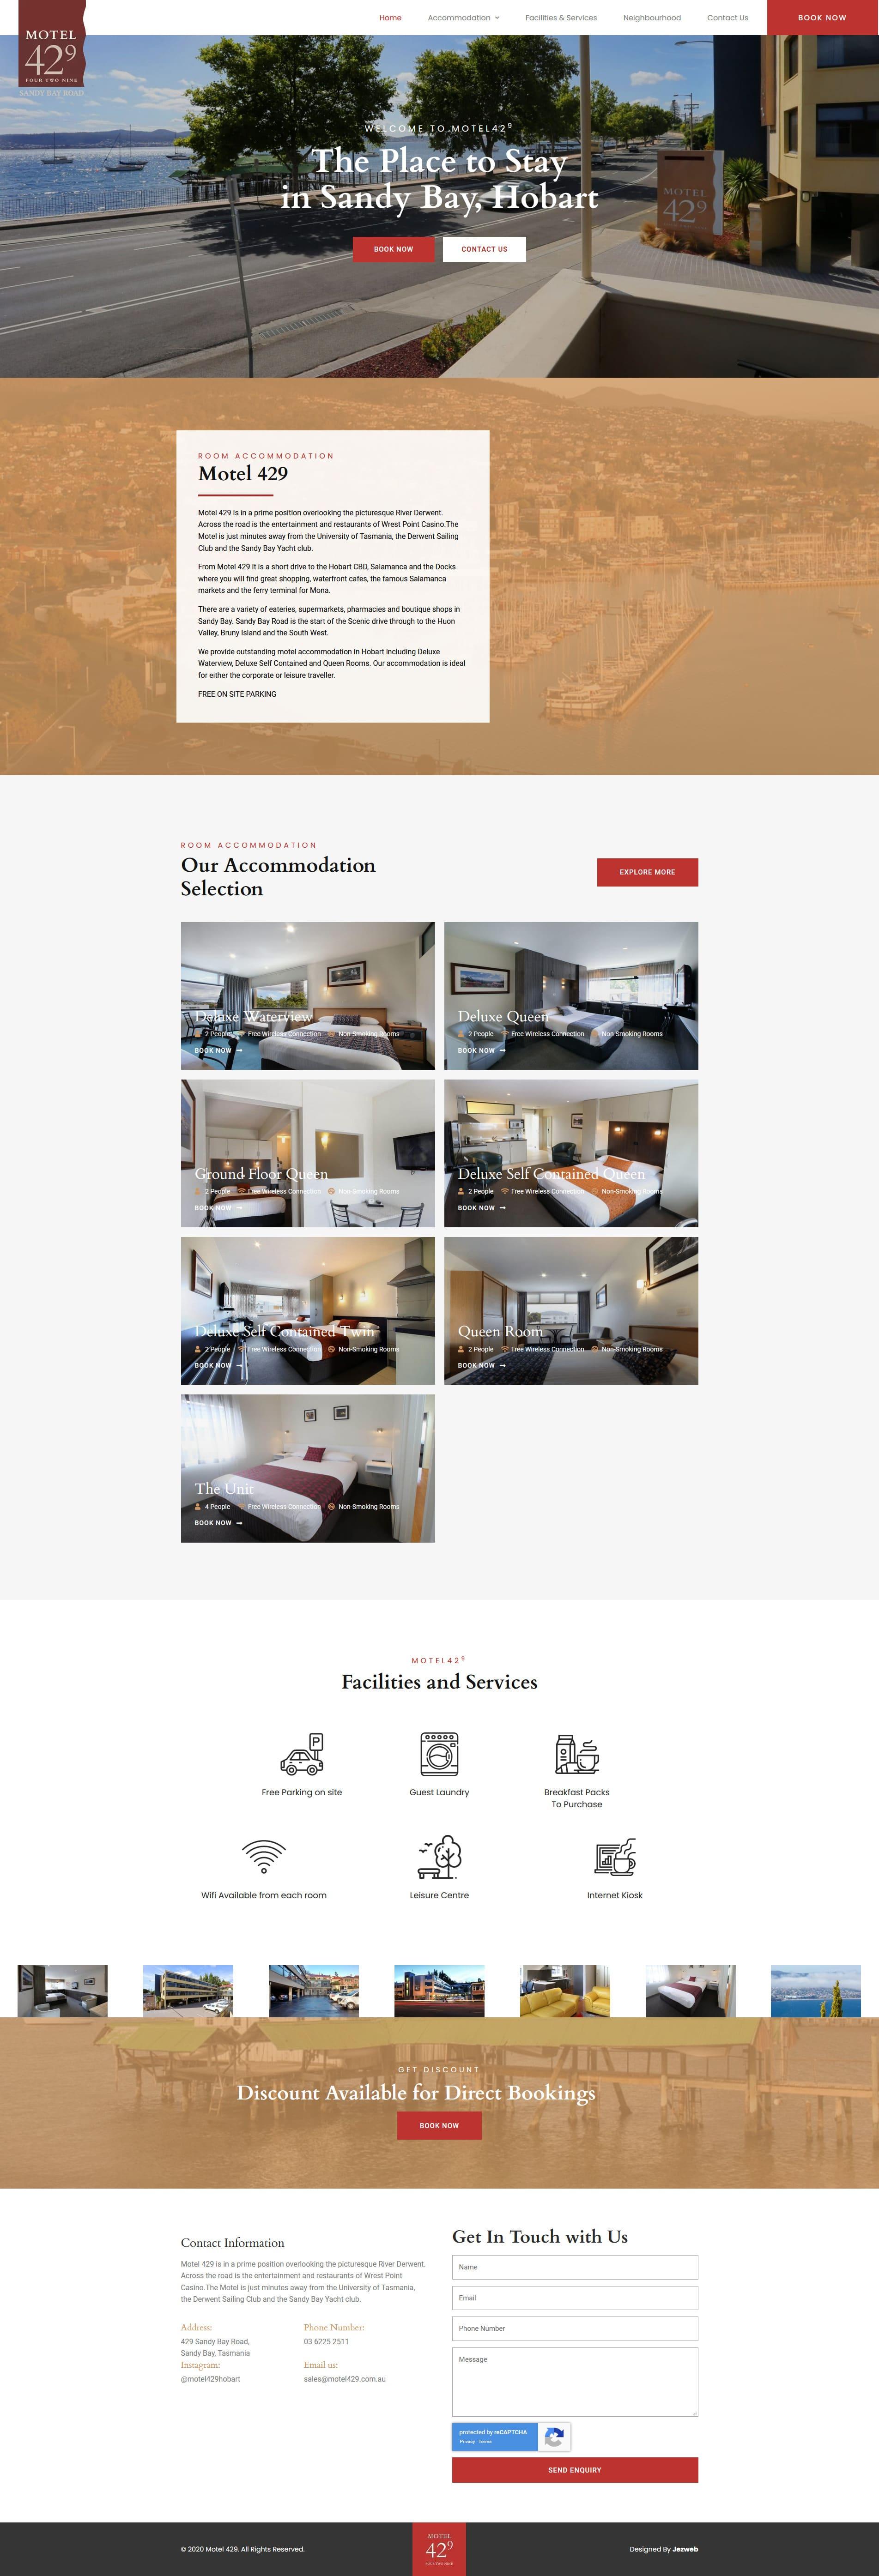 Motel 429 -